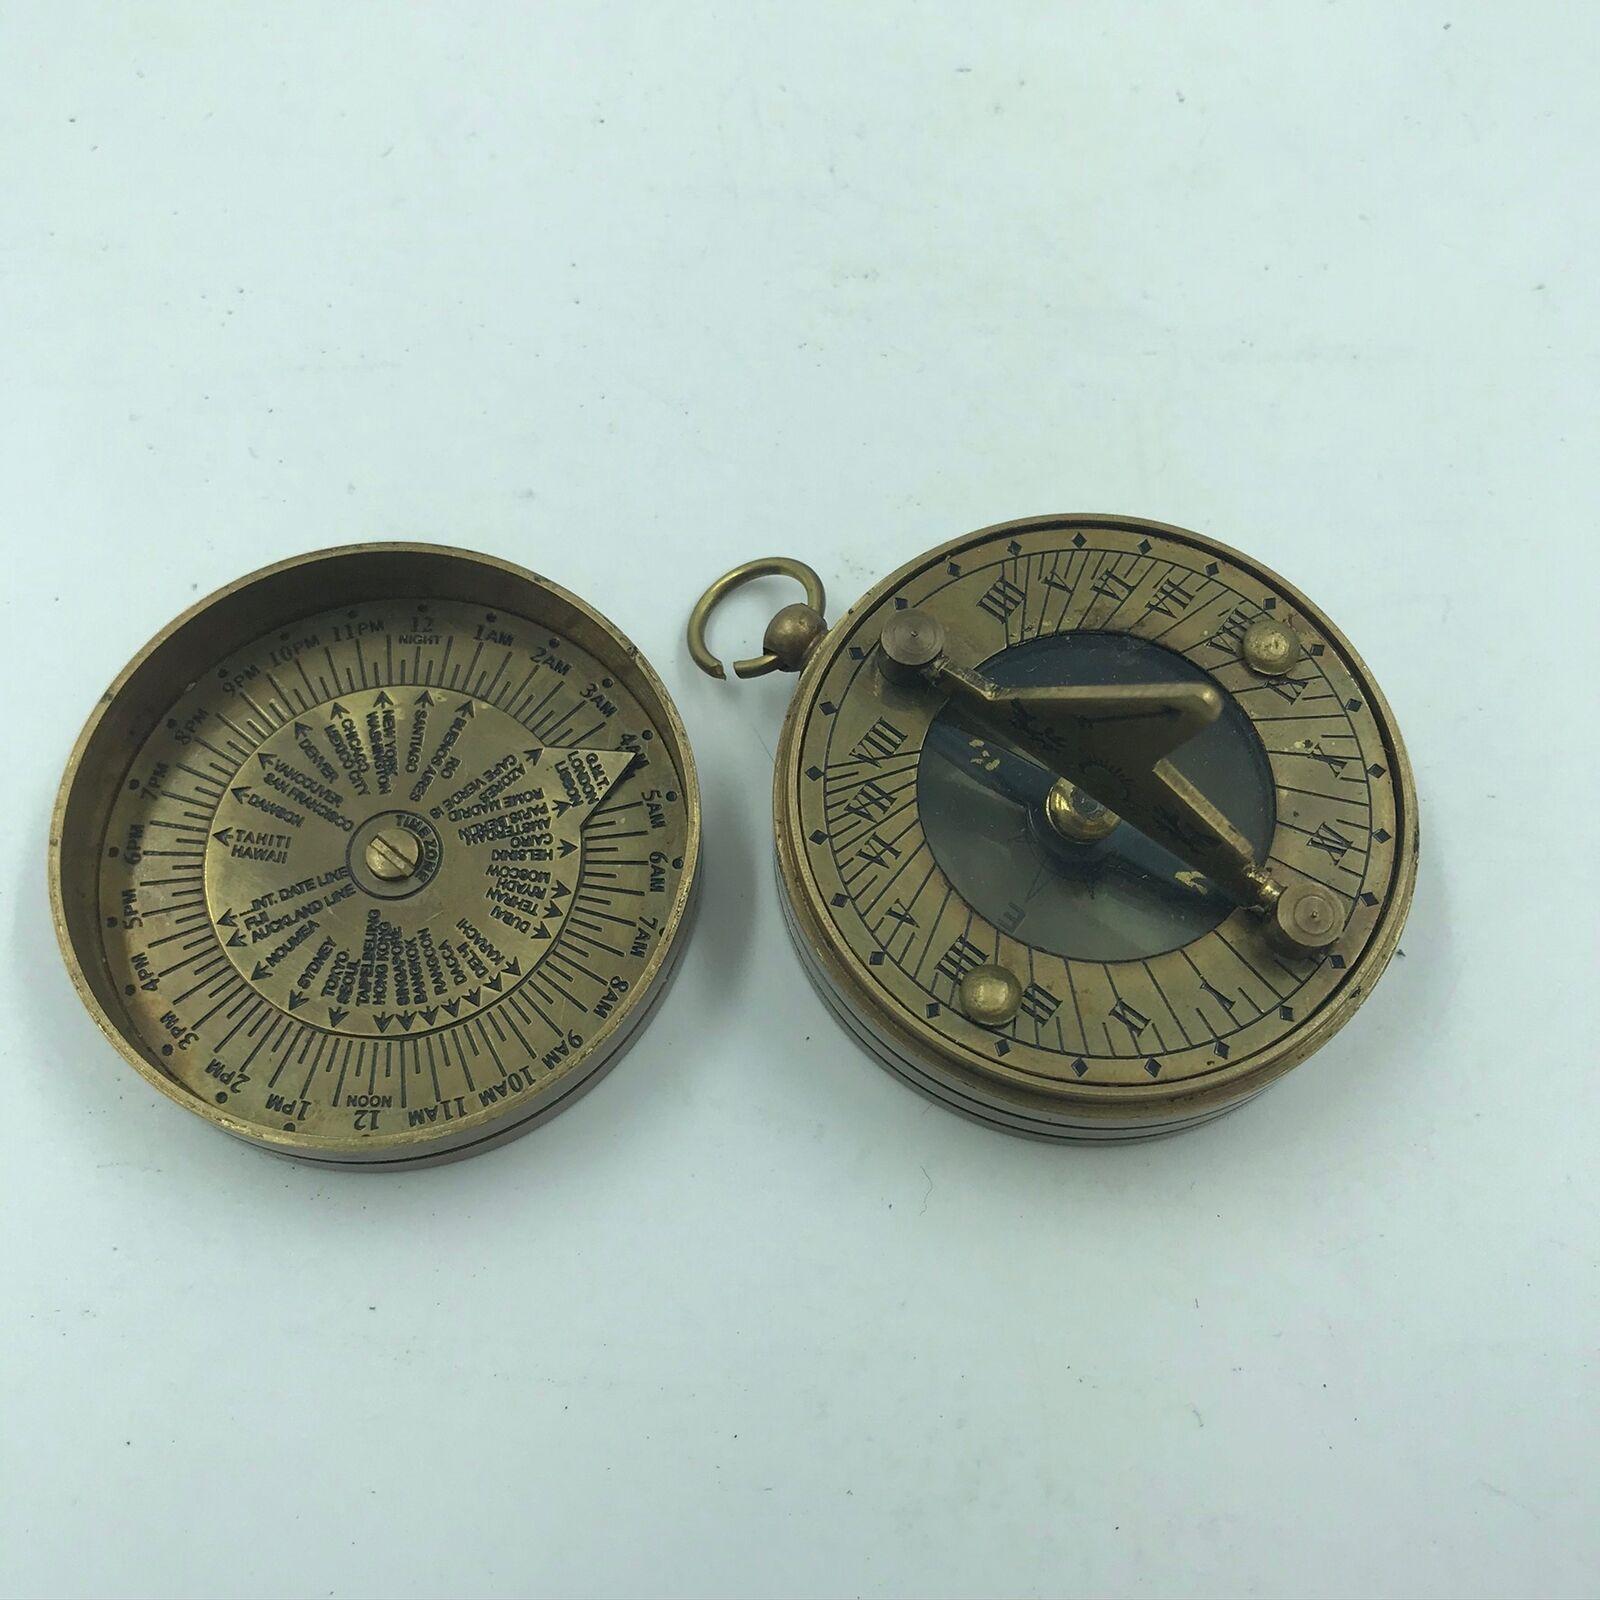 Nautical Sundial Compass Gift Brass Antique Pocket Push Button Sundial Compass.